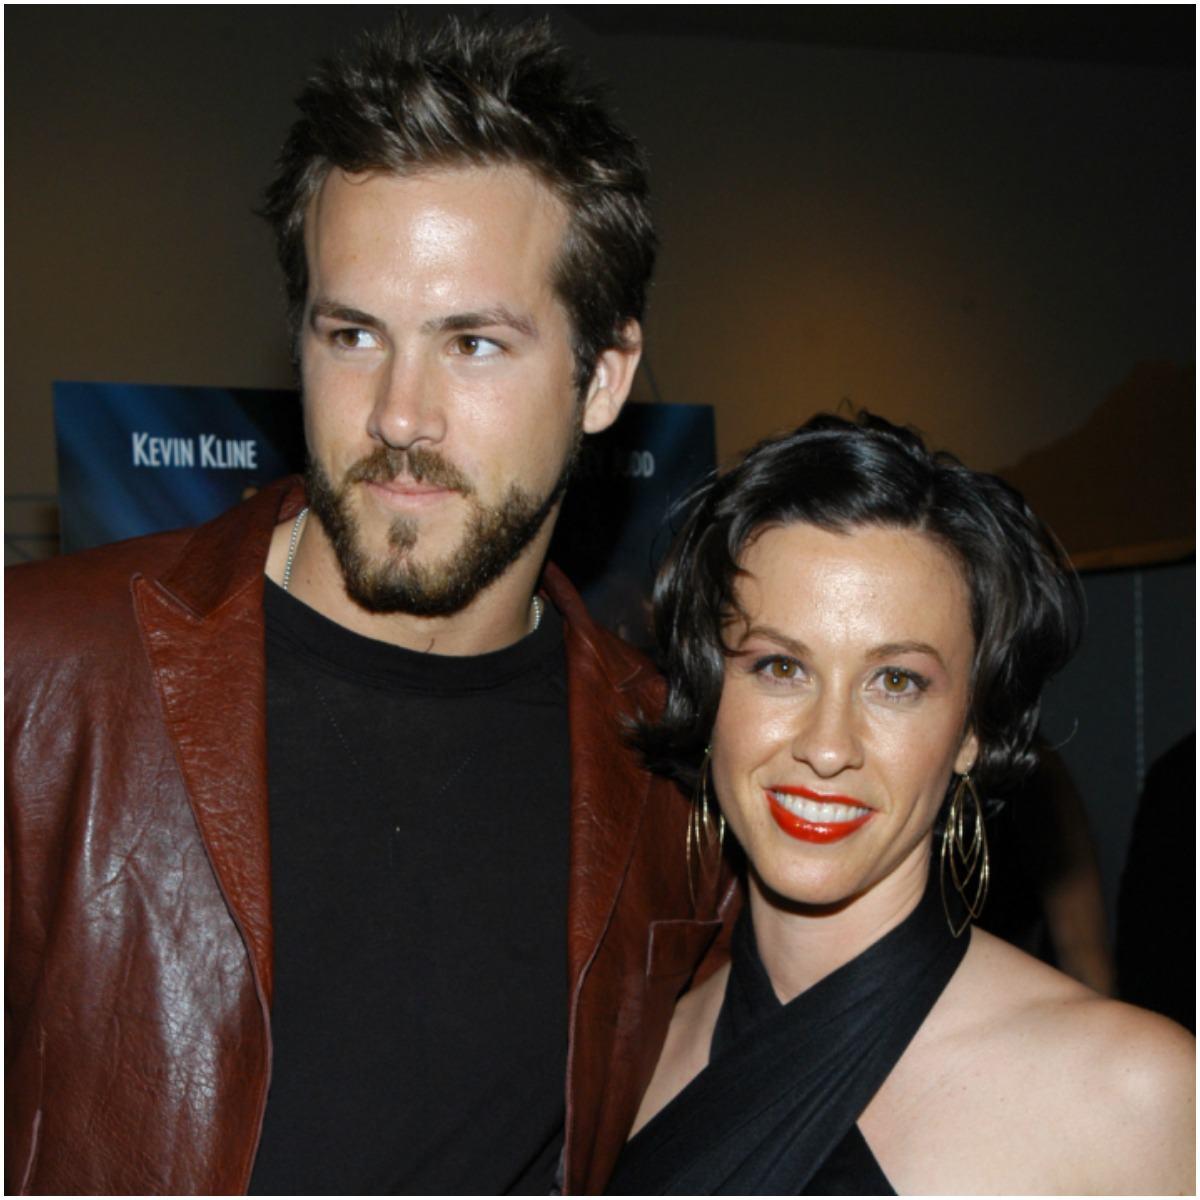 Alanis Morissette and her fiance Ryan Reynolds